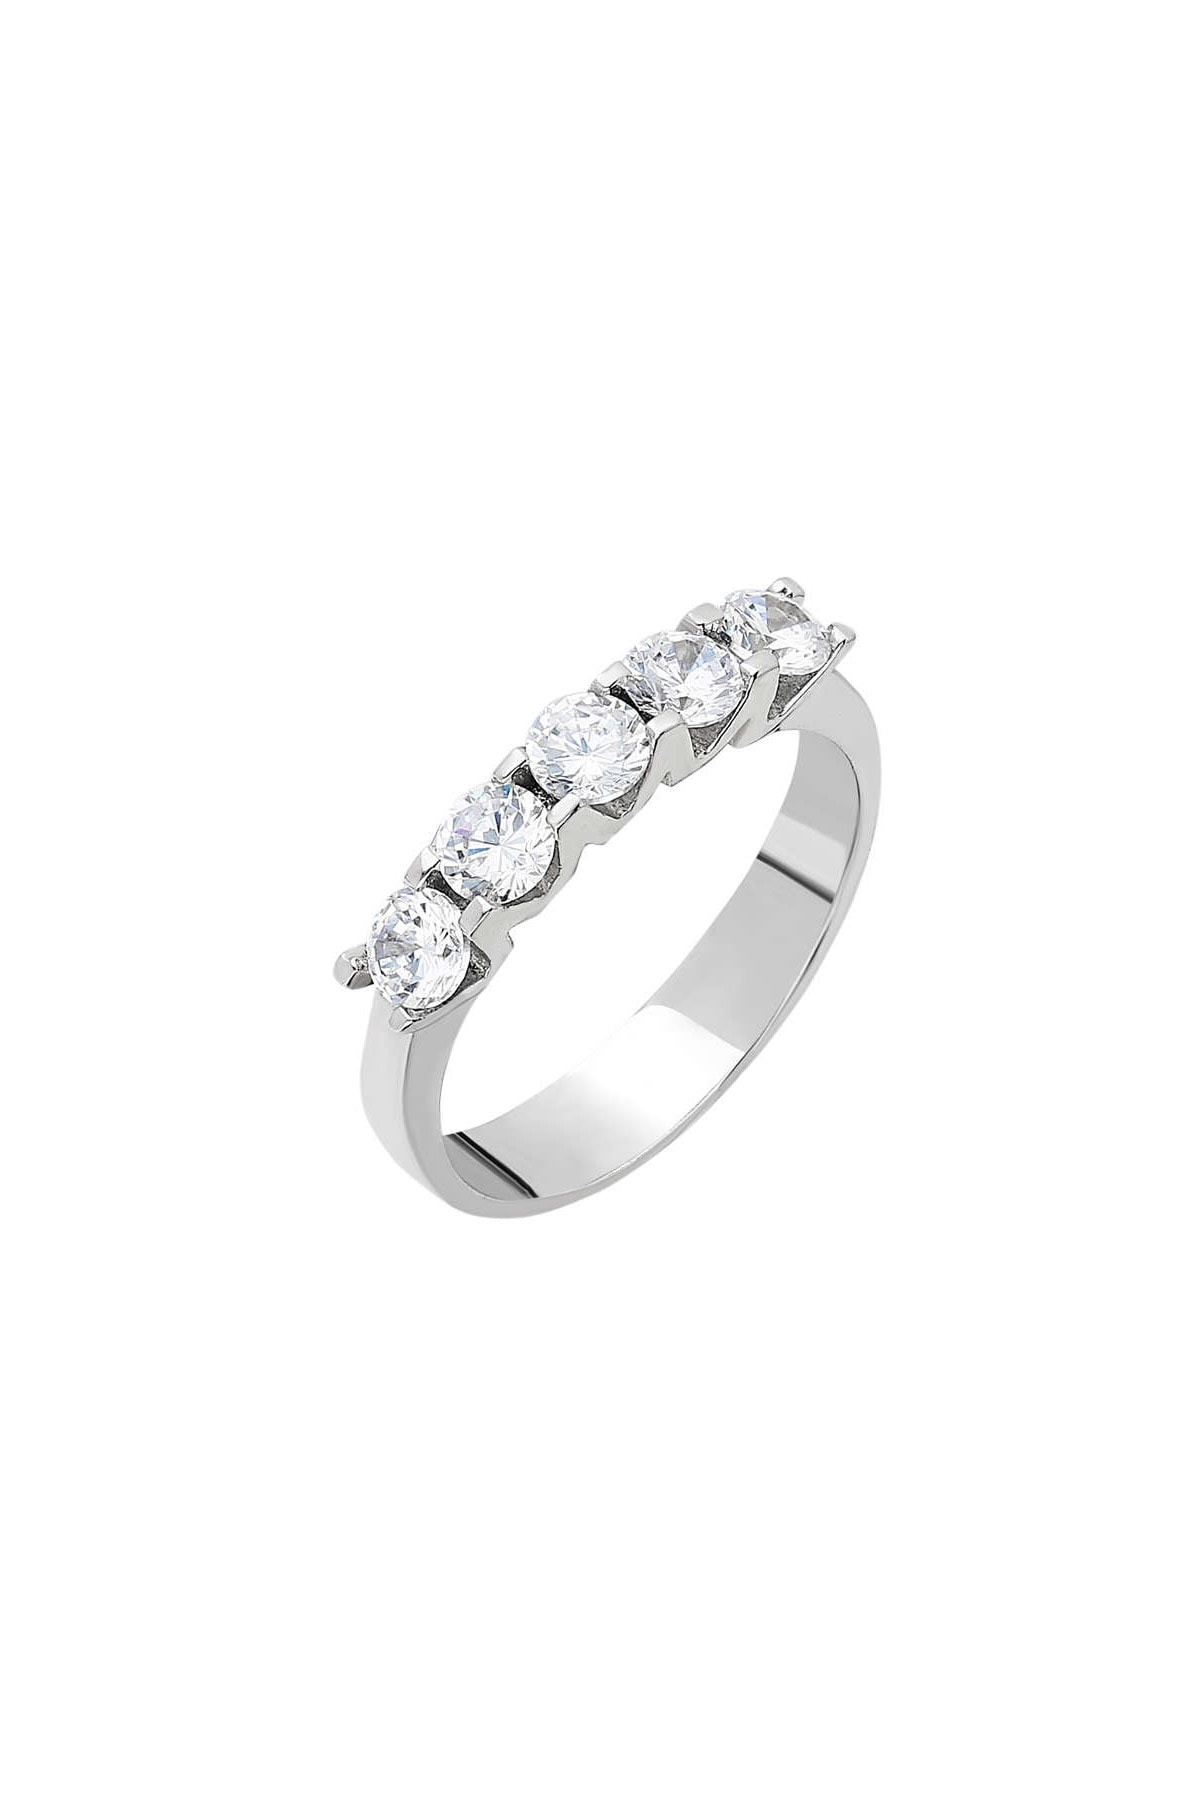 Tesbihane Starlight Diamond Pırlanta Montür Mini Tasarım 925 Ayar Gümüş Bayan Beştaş Yüzük 102001809 3